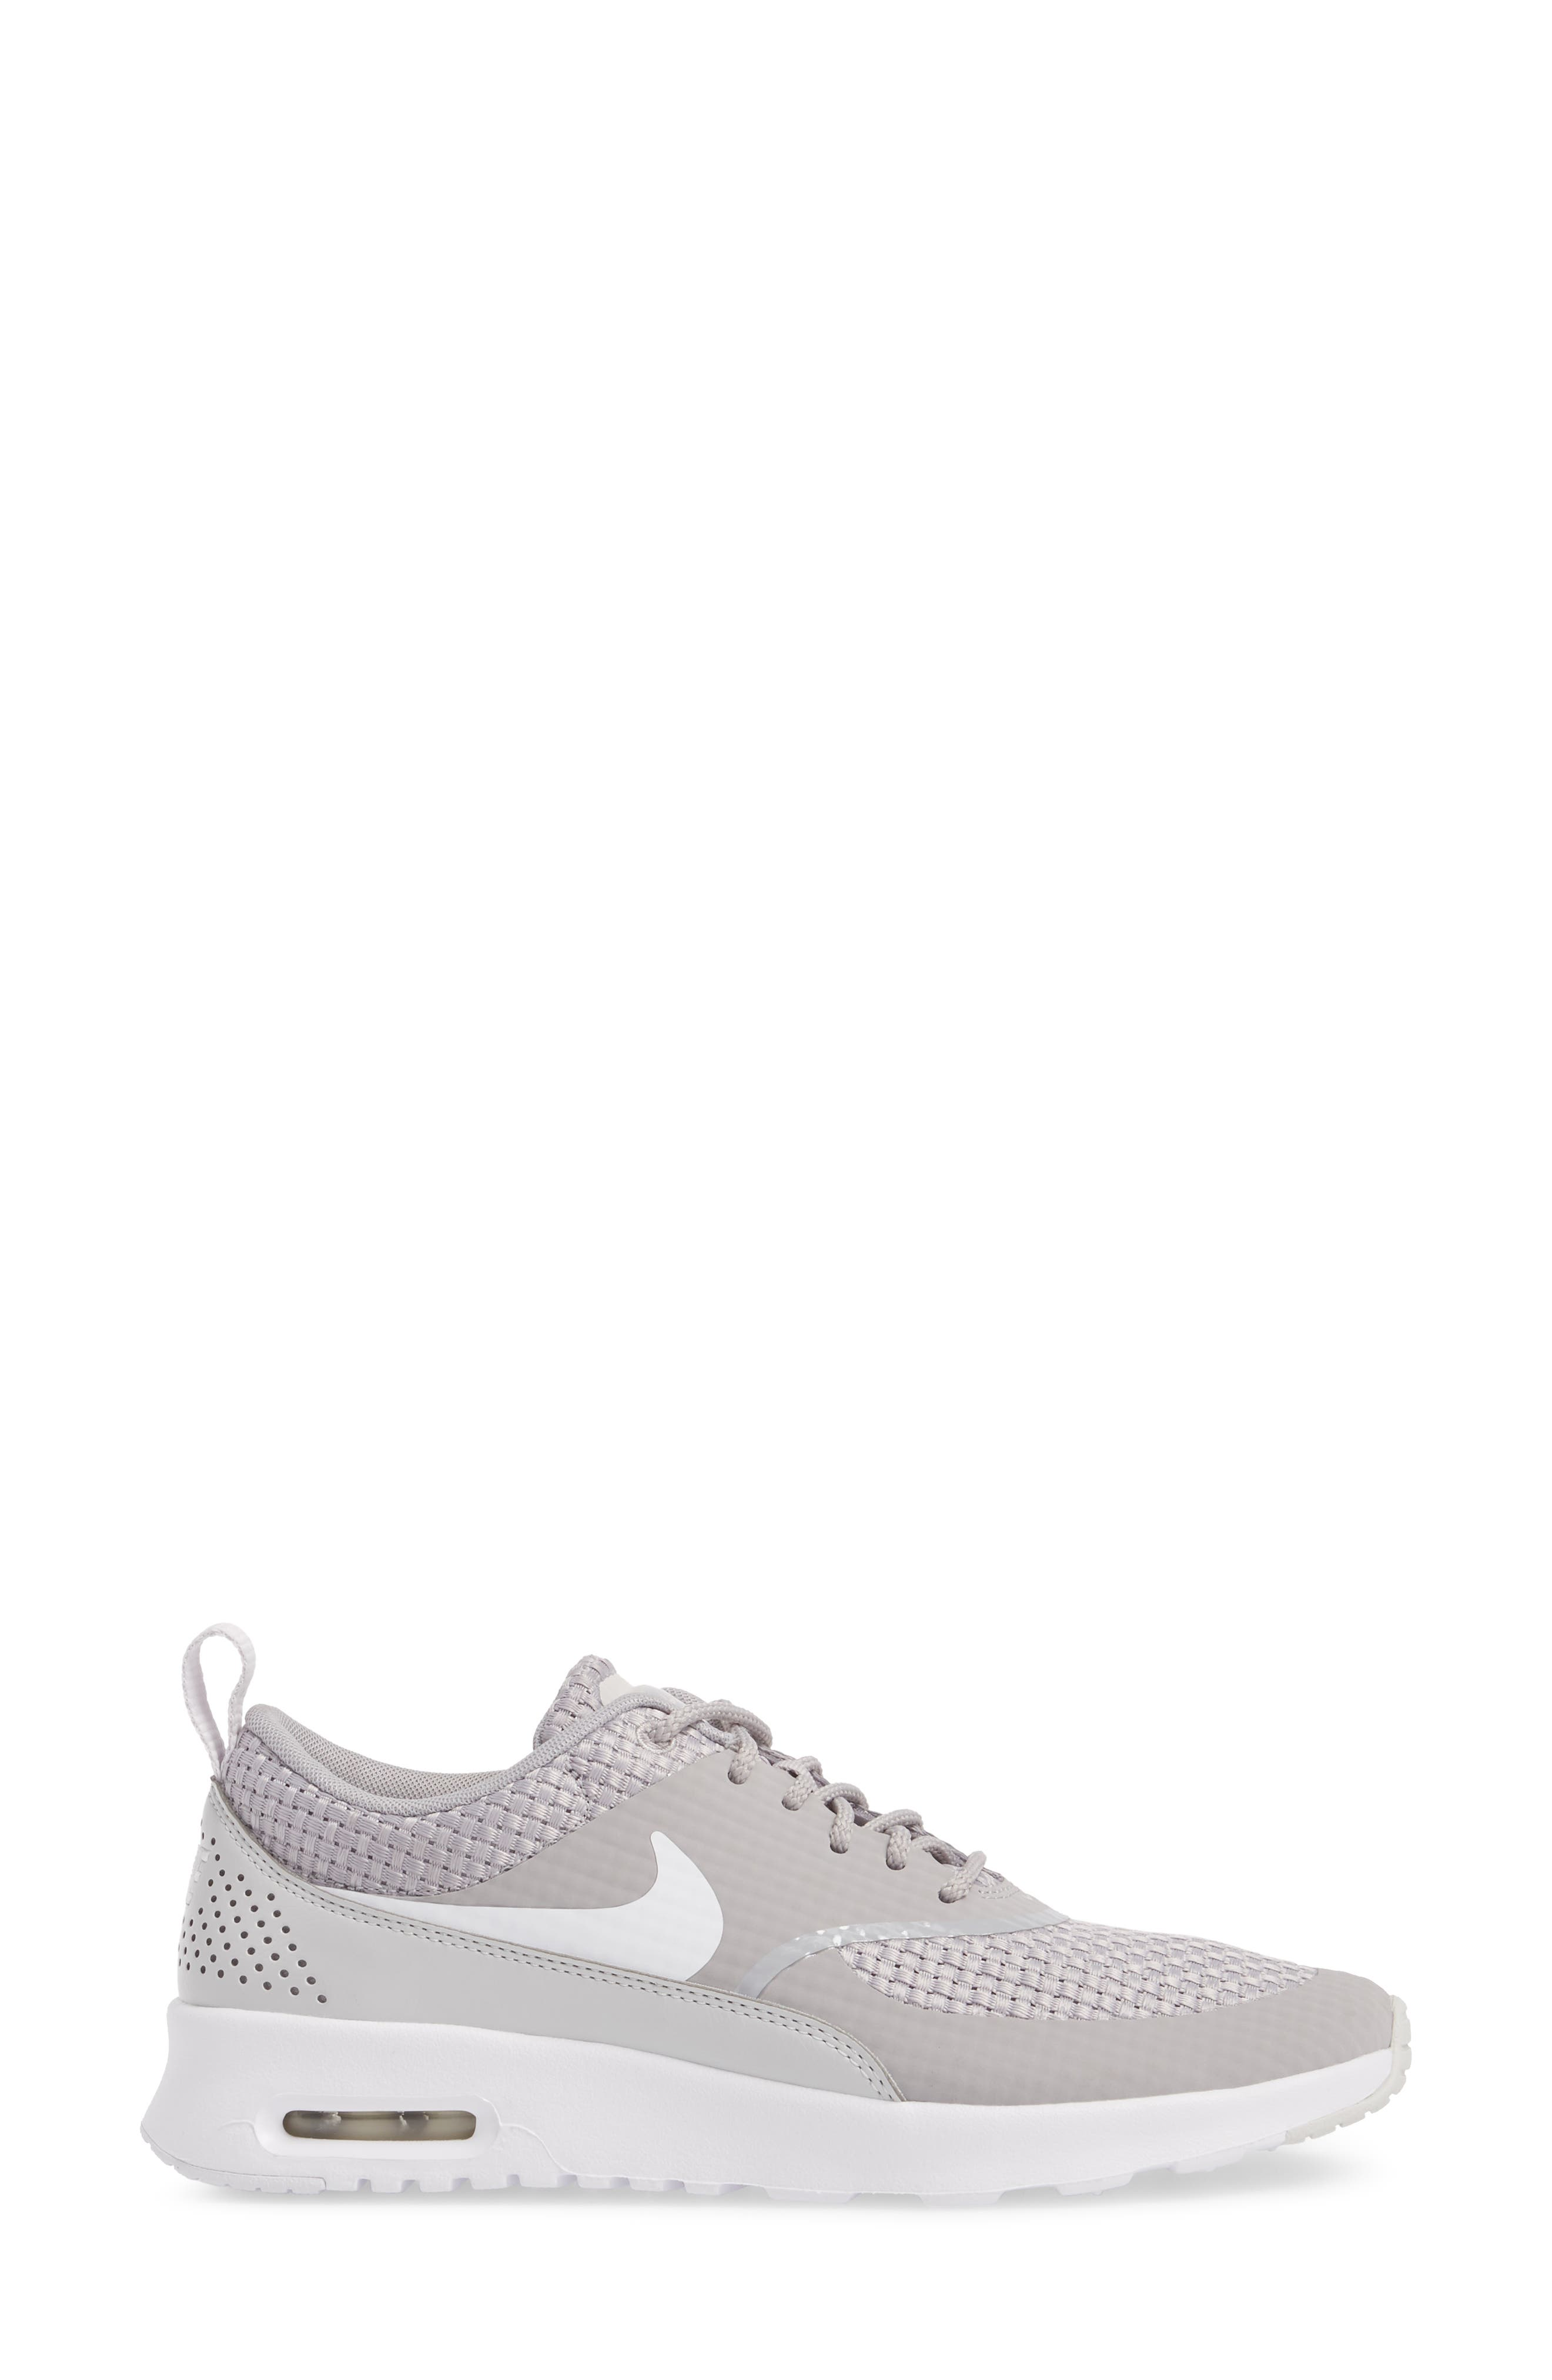 Air Max Thea Sneaker,                             Alternate thumbnail 3, color,                             ATMOSPHERE GREY/ WHITE